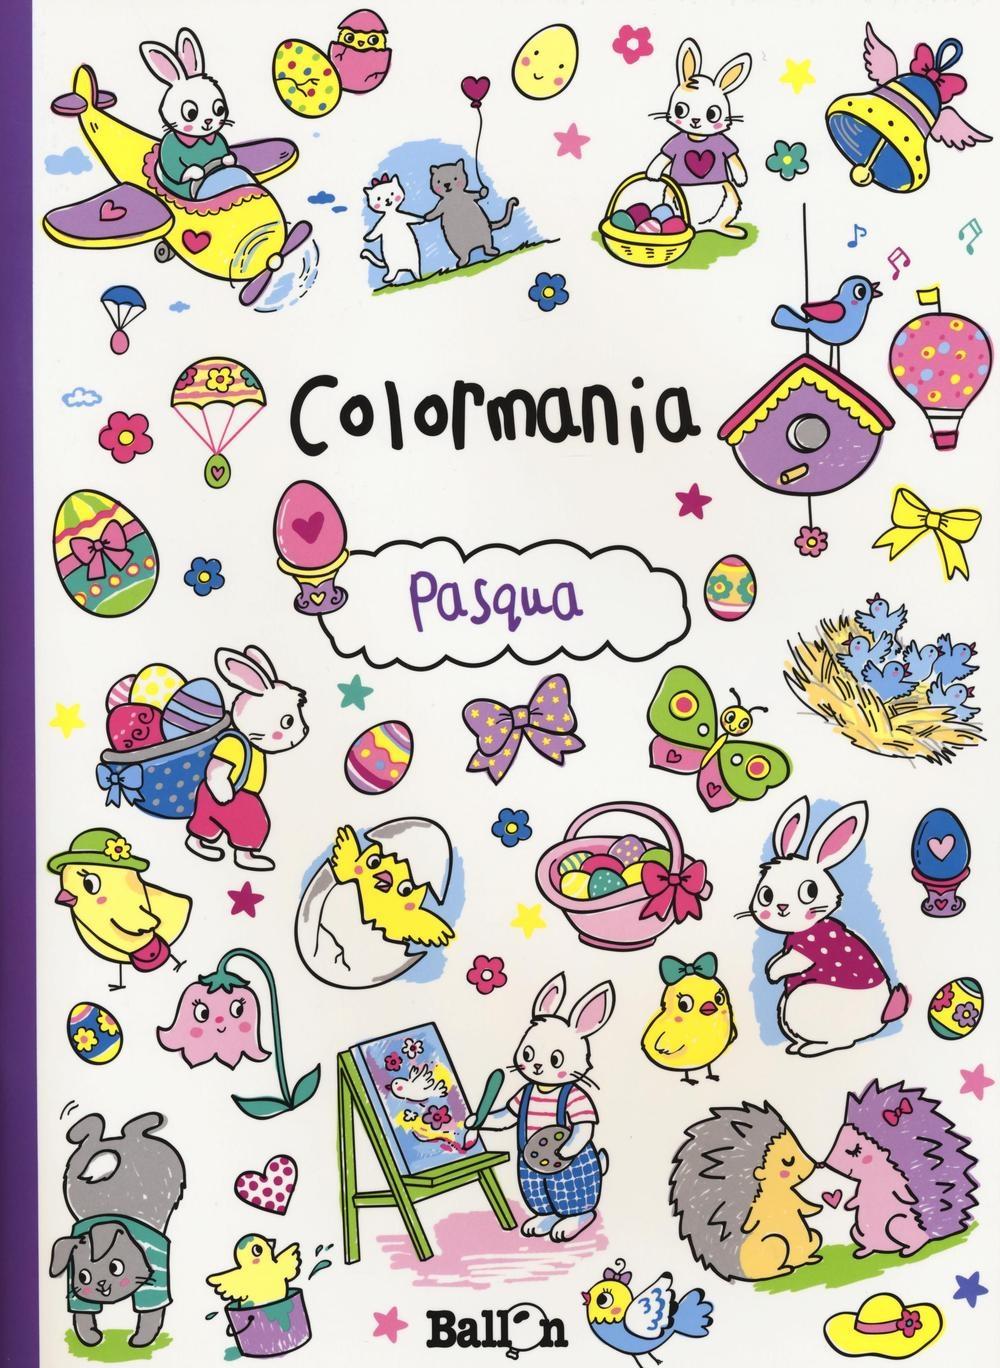 Pasqua. Colormania. Ediz. illustrata